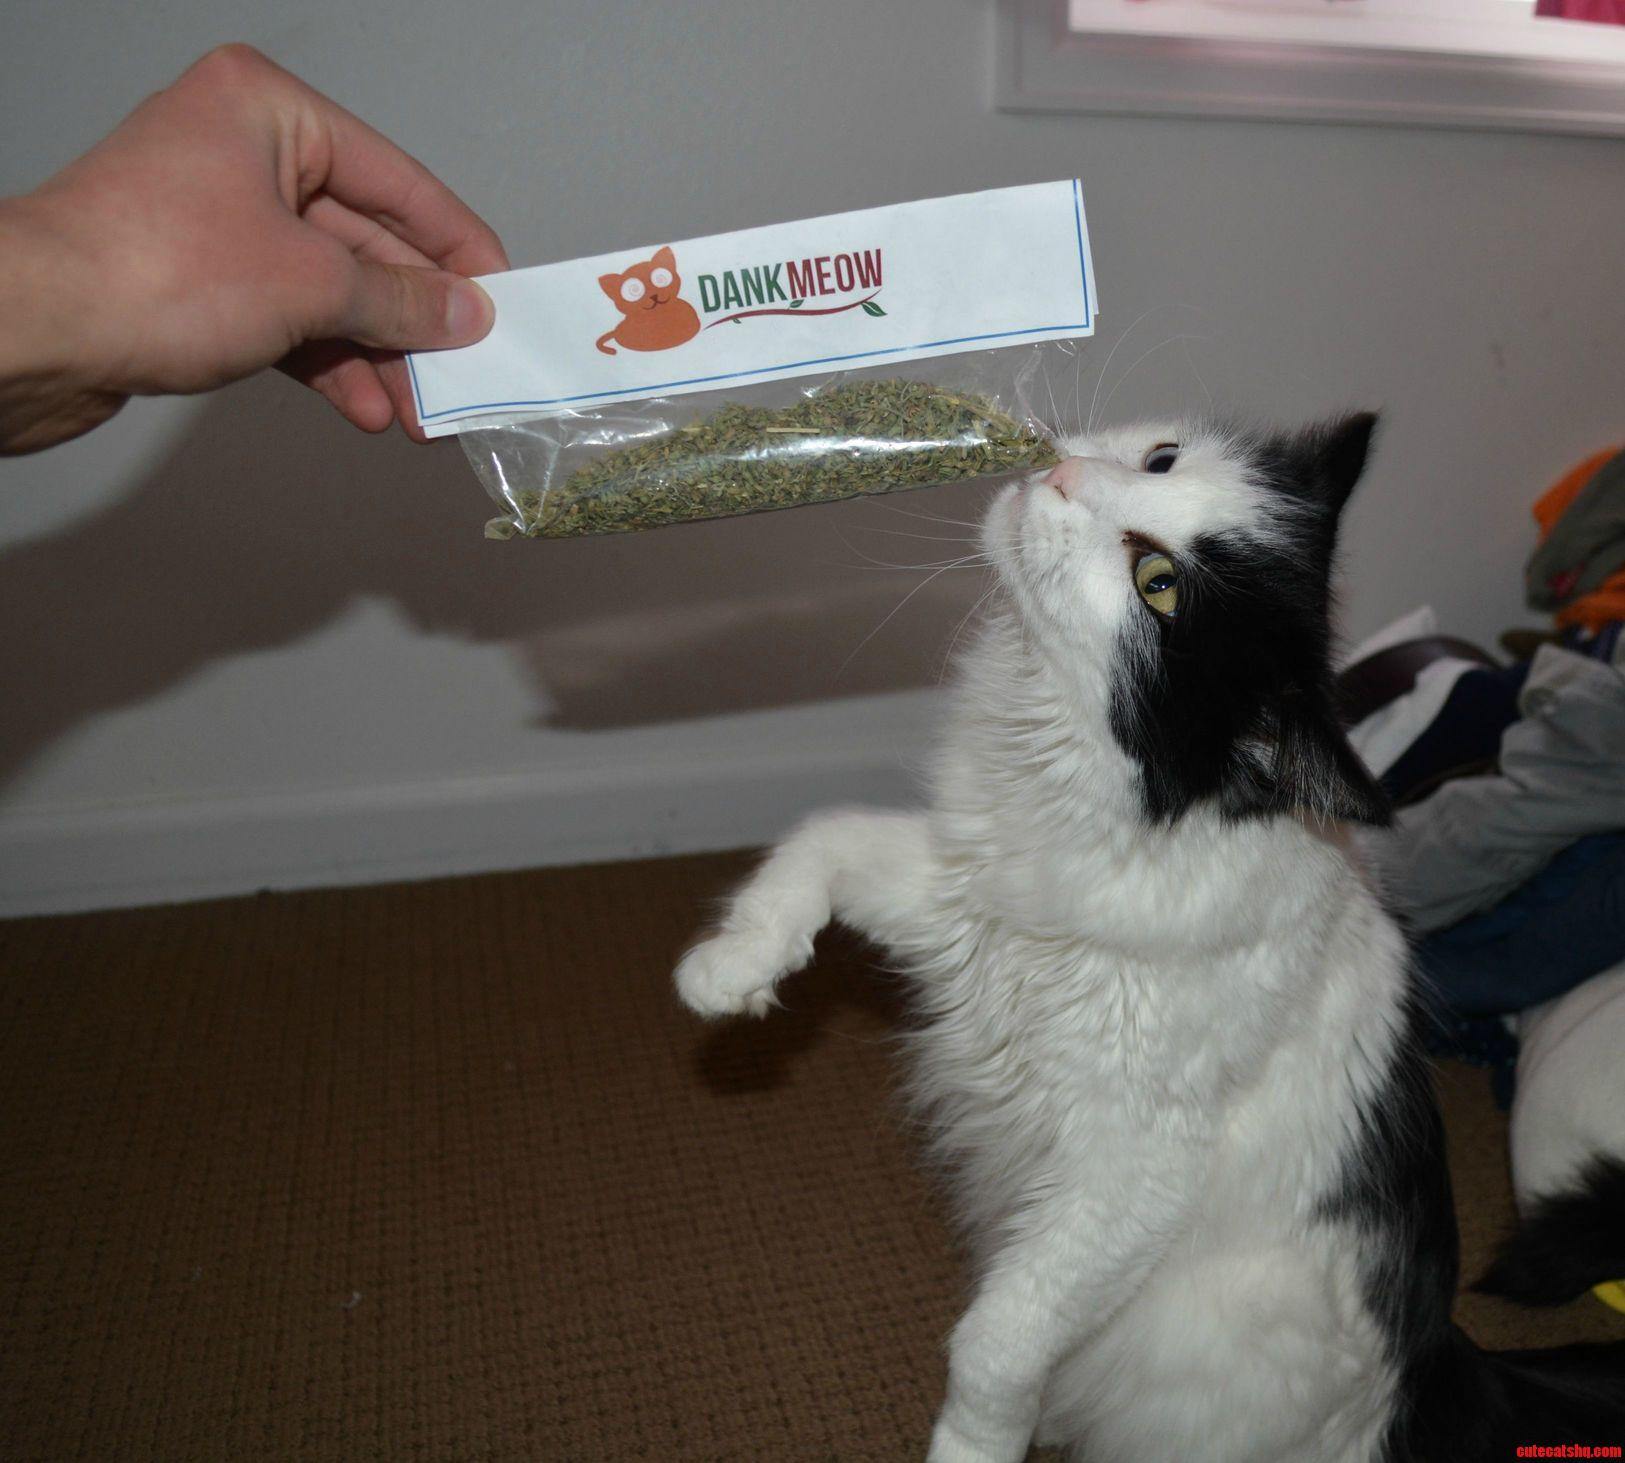 I think my cat likes her new catnip